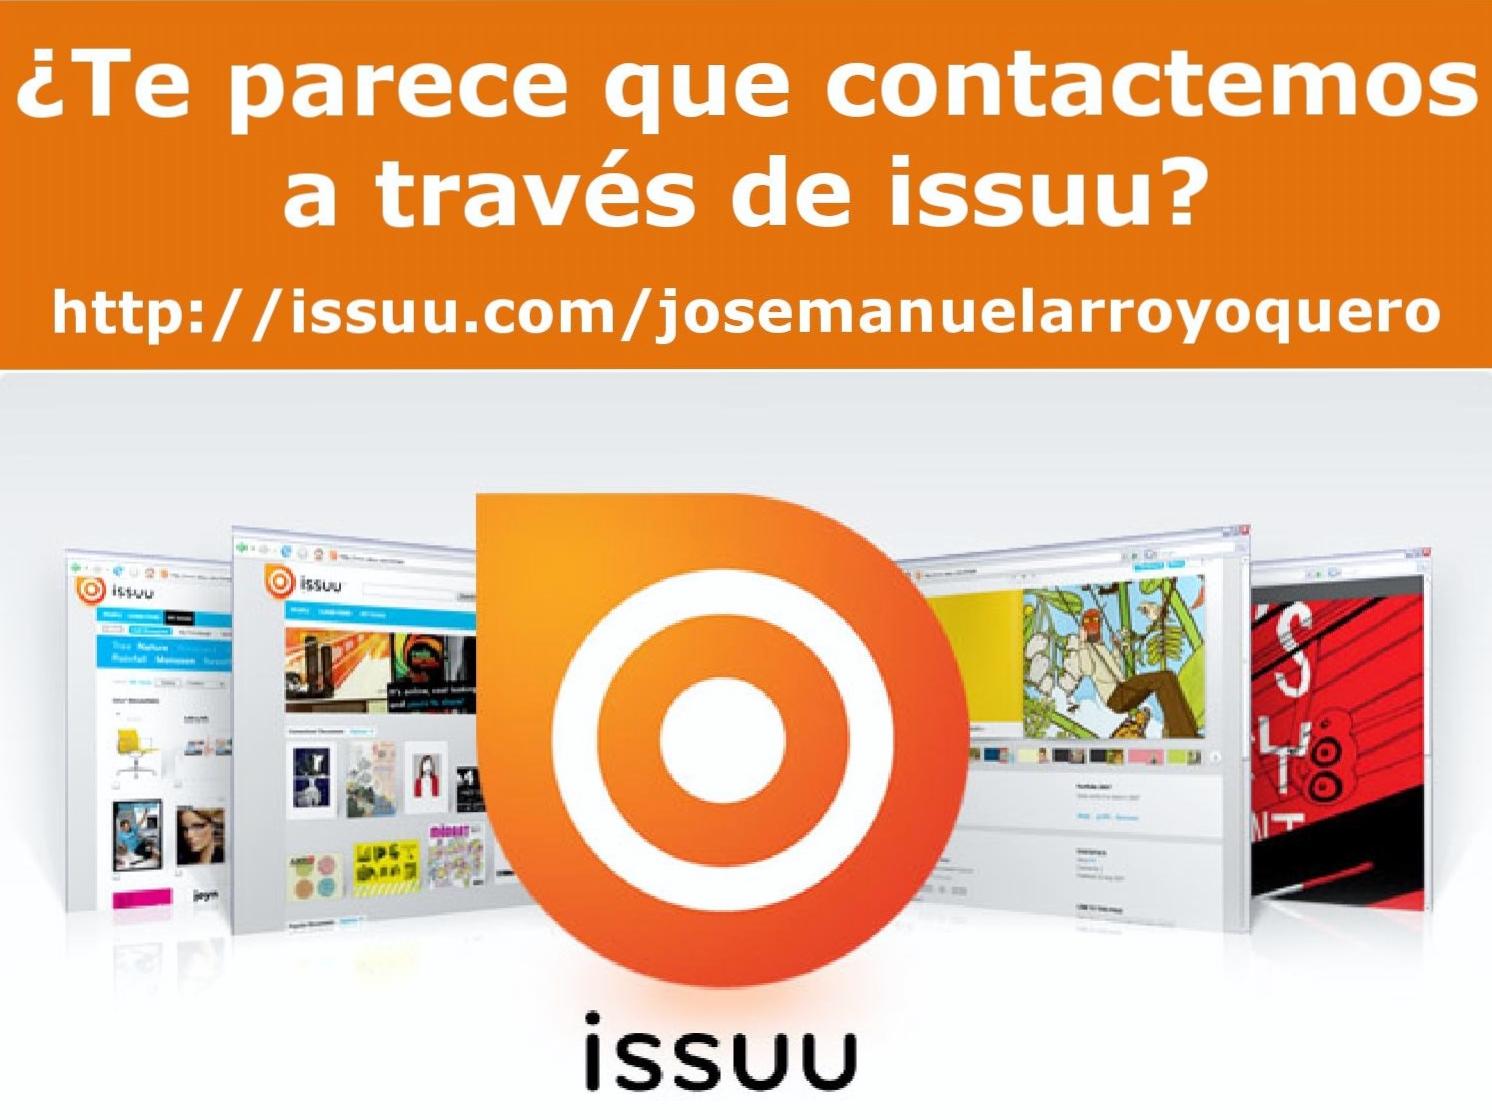 ¿Contactamos a través de ISSUU?